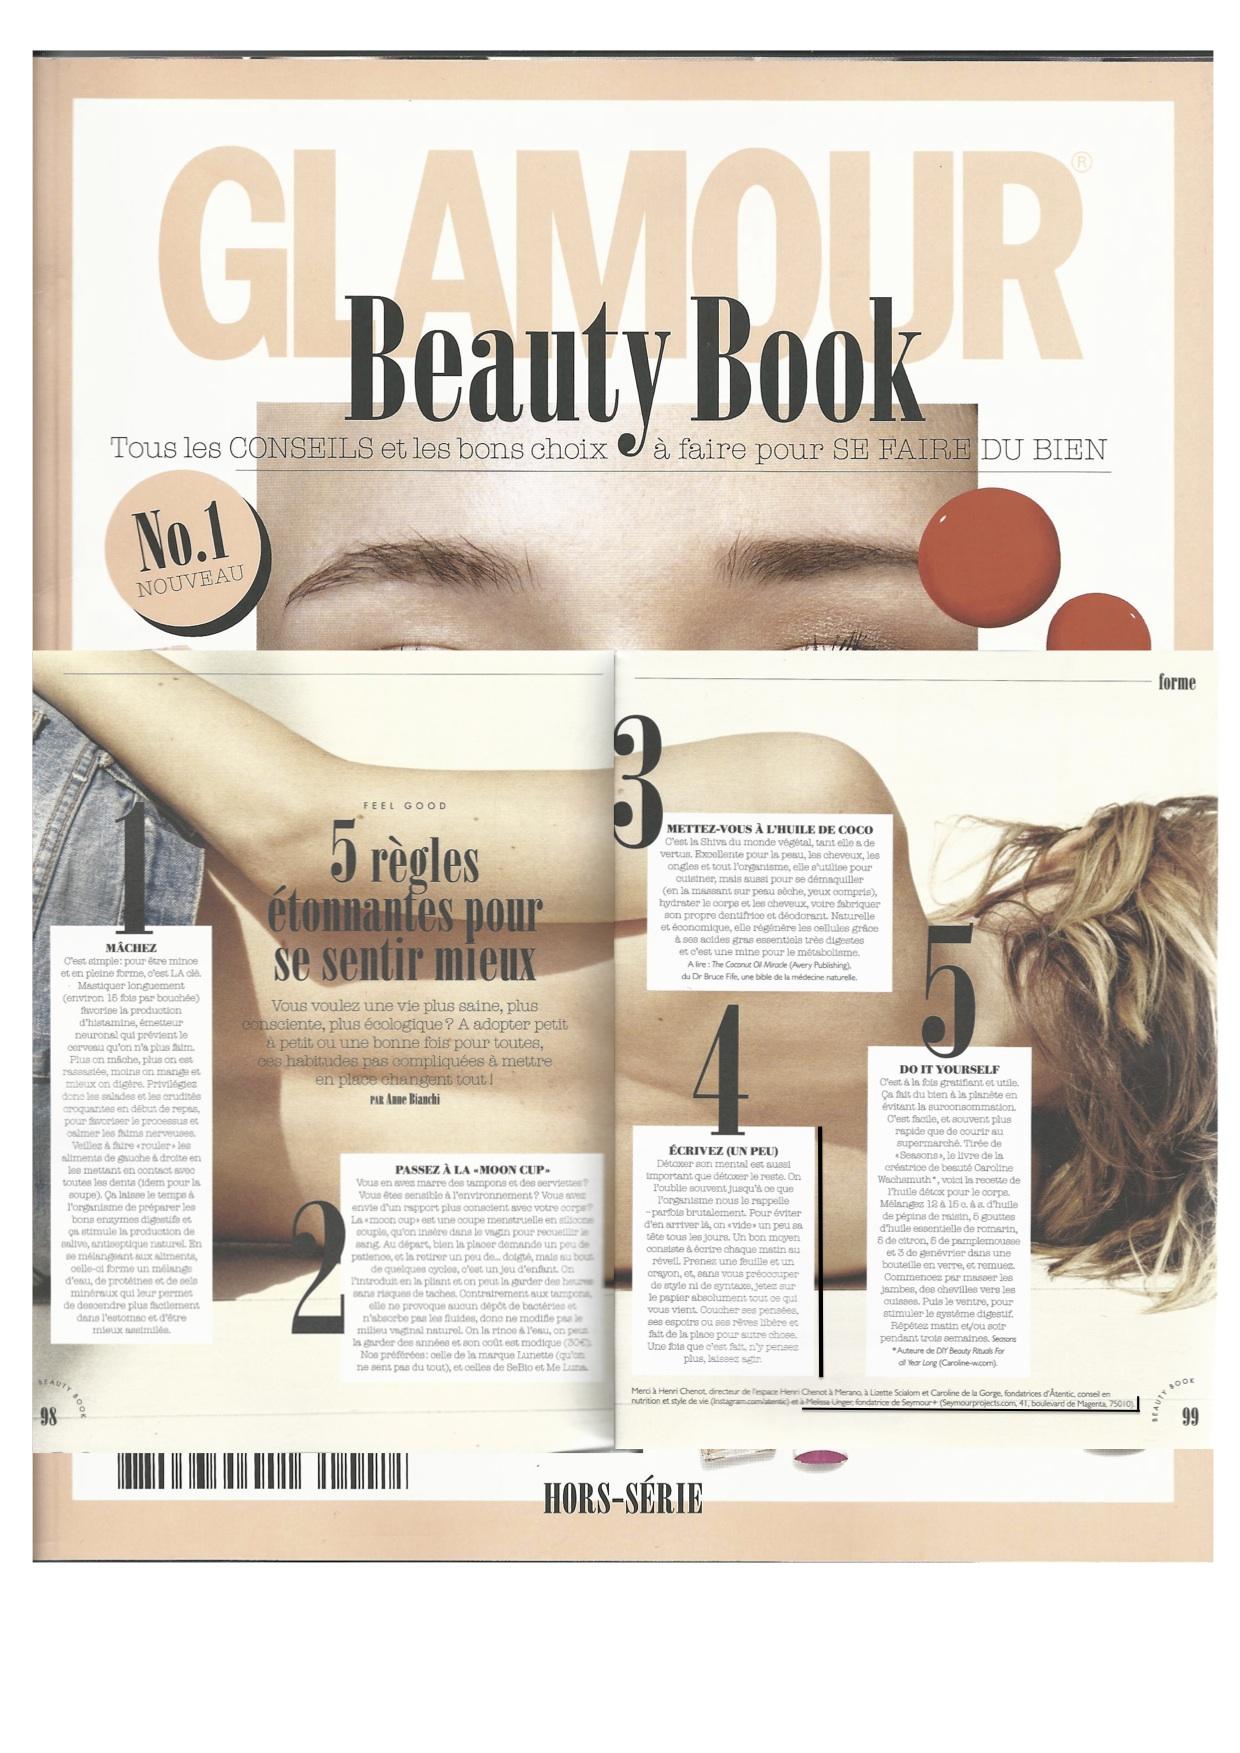 Press seymour projects glamour beauty book solutioingenieria Choice Image